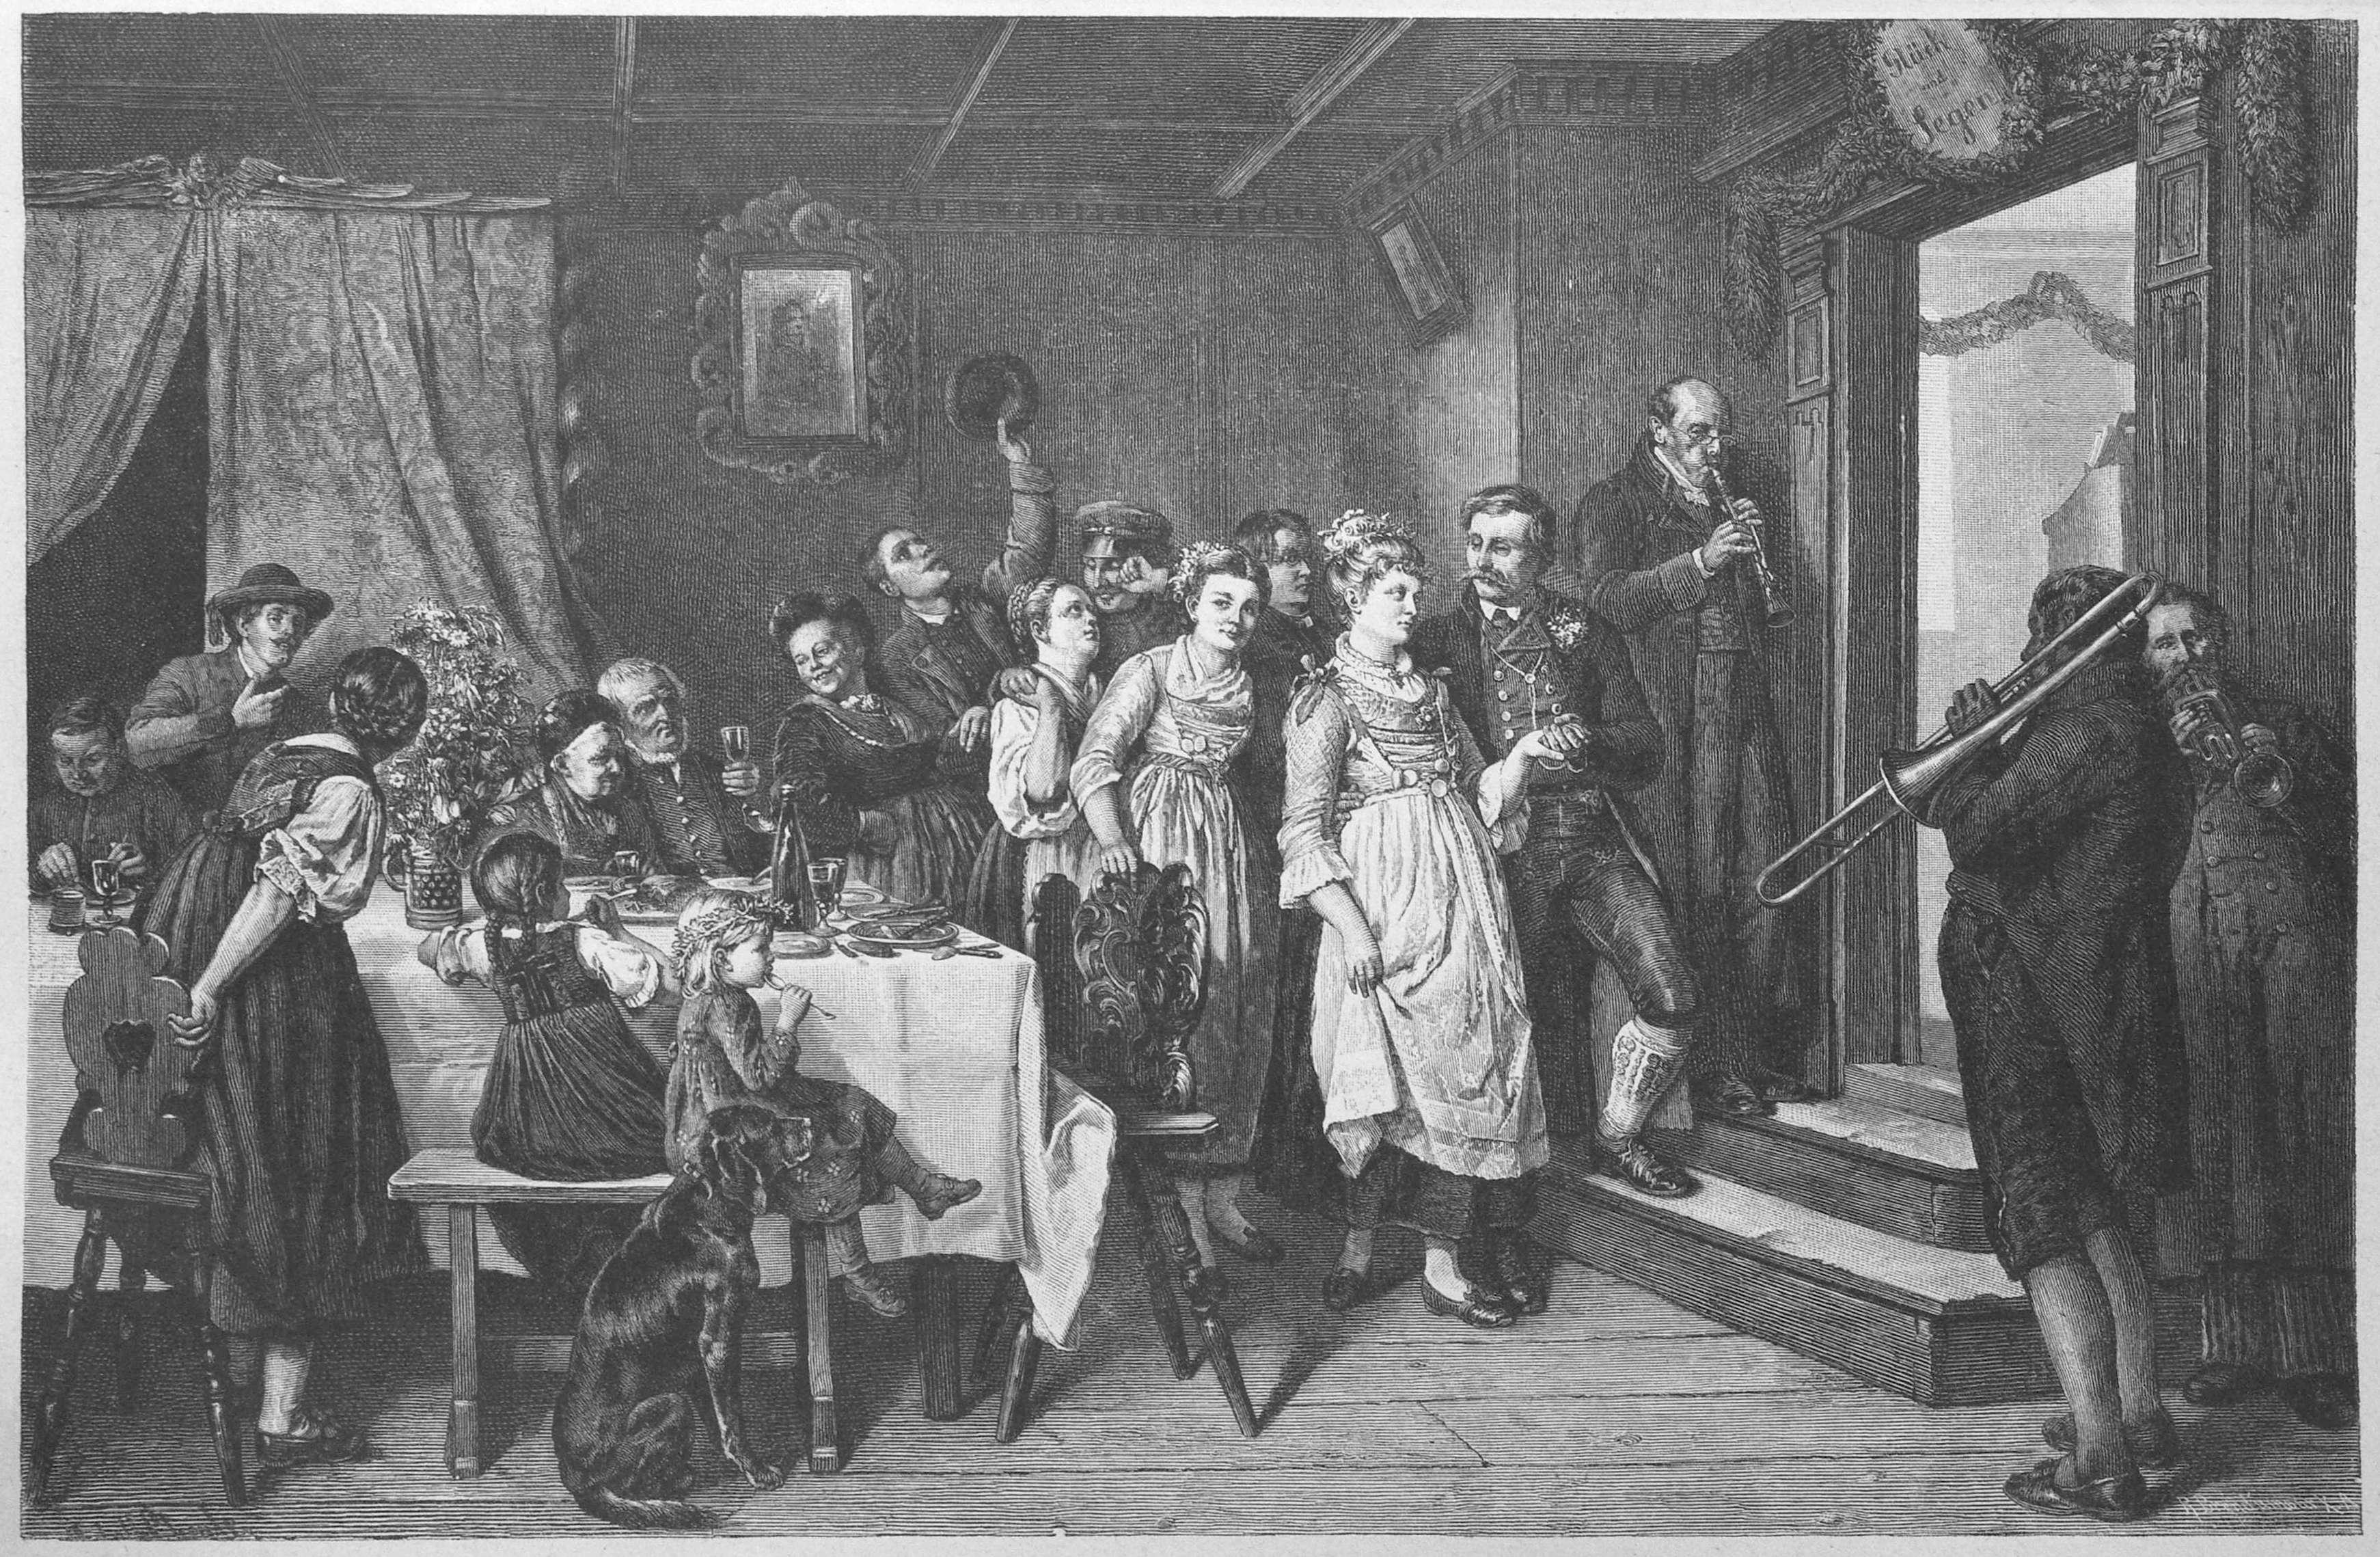 Die_Gartenlaube_(1882)_b_245